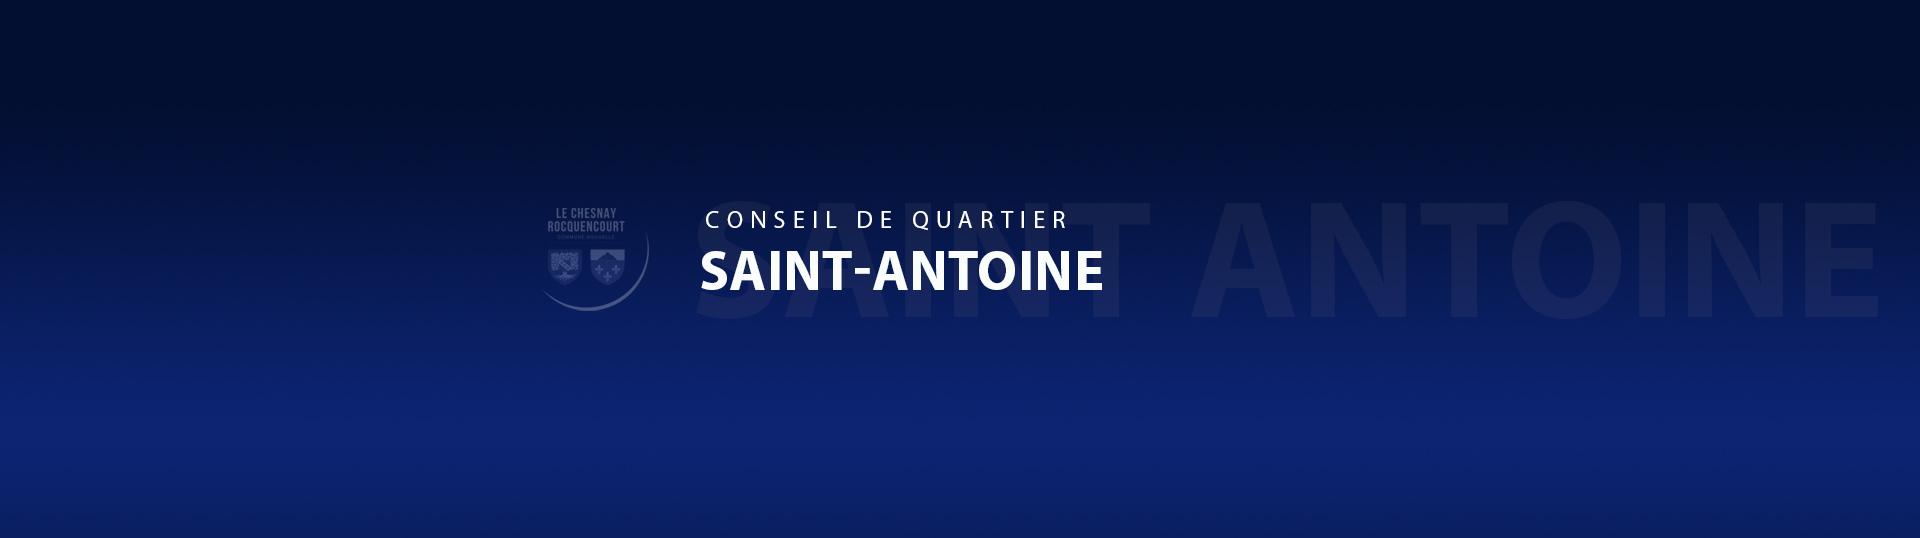 CDQ Saint-Antoine